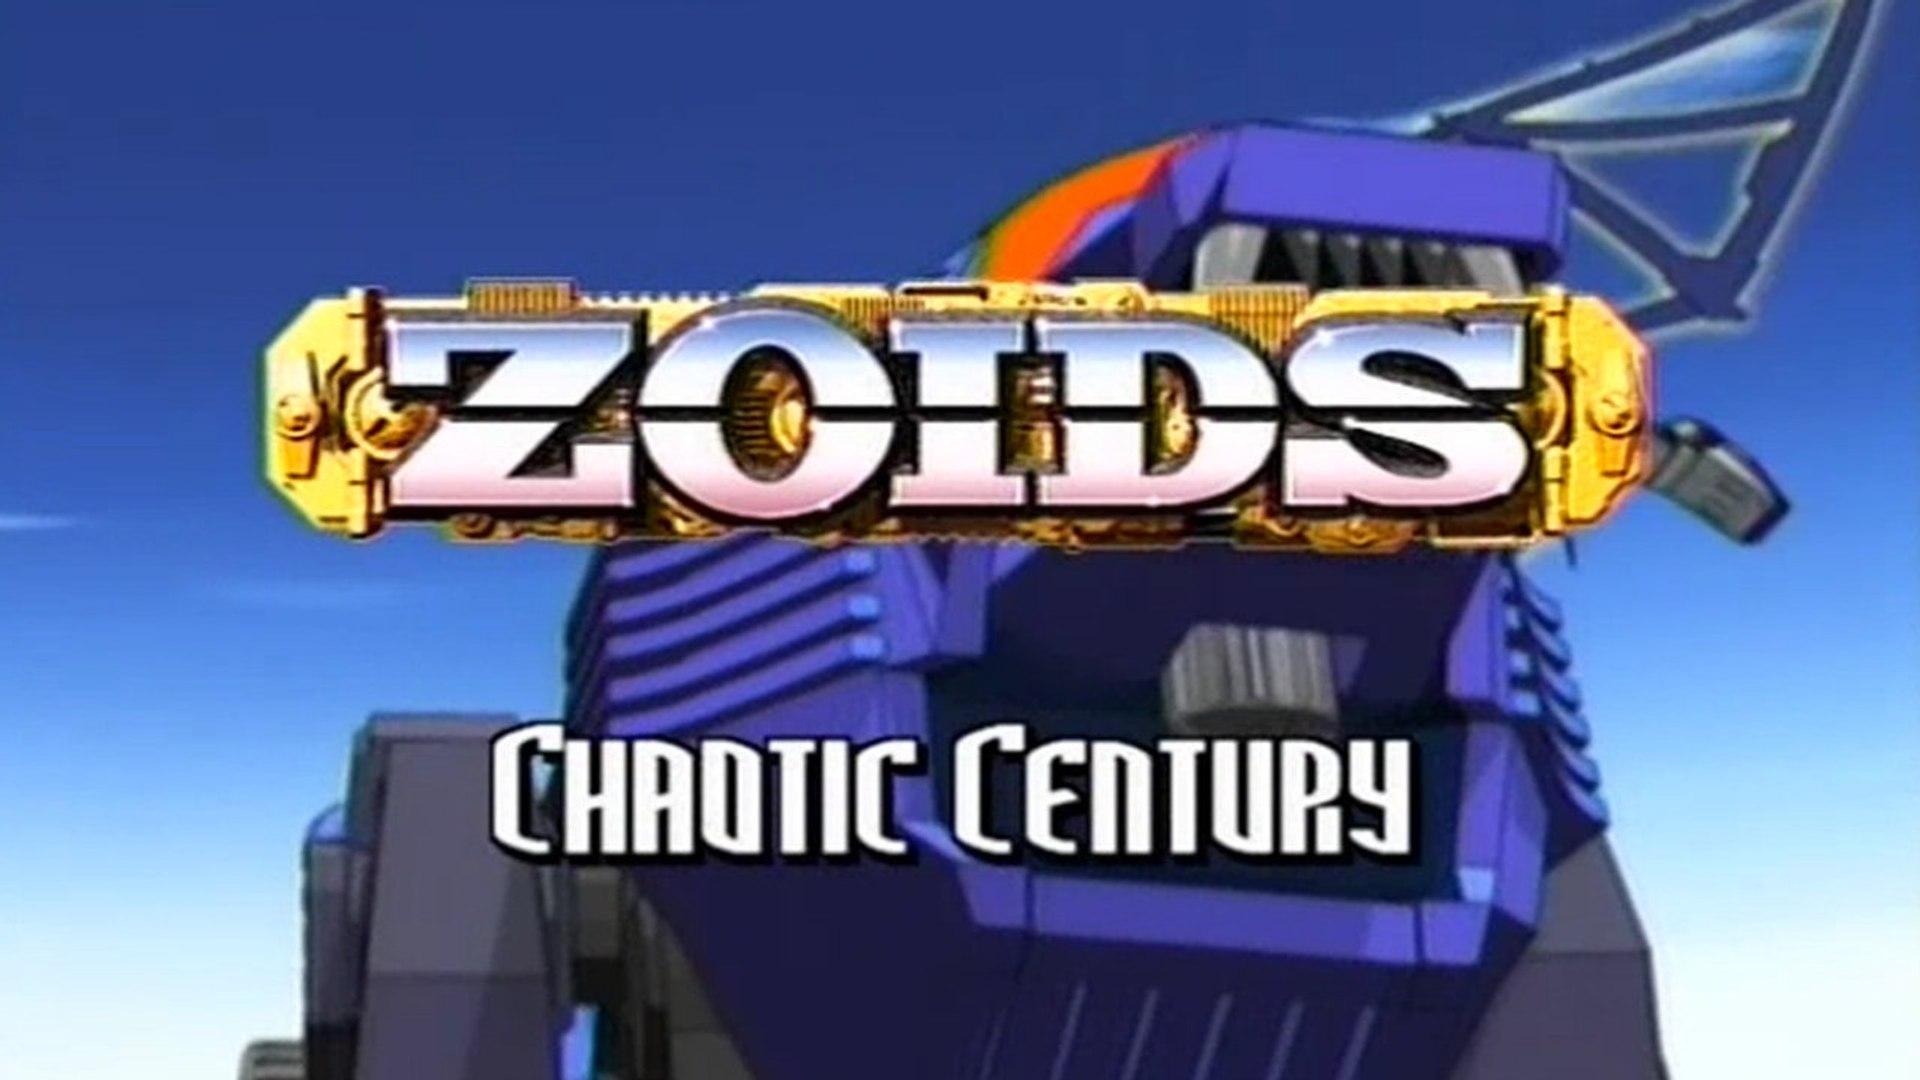 Zoids chaotic century opening